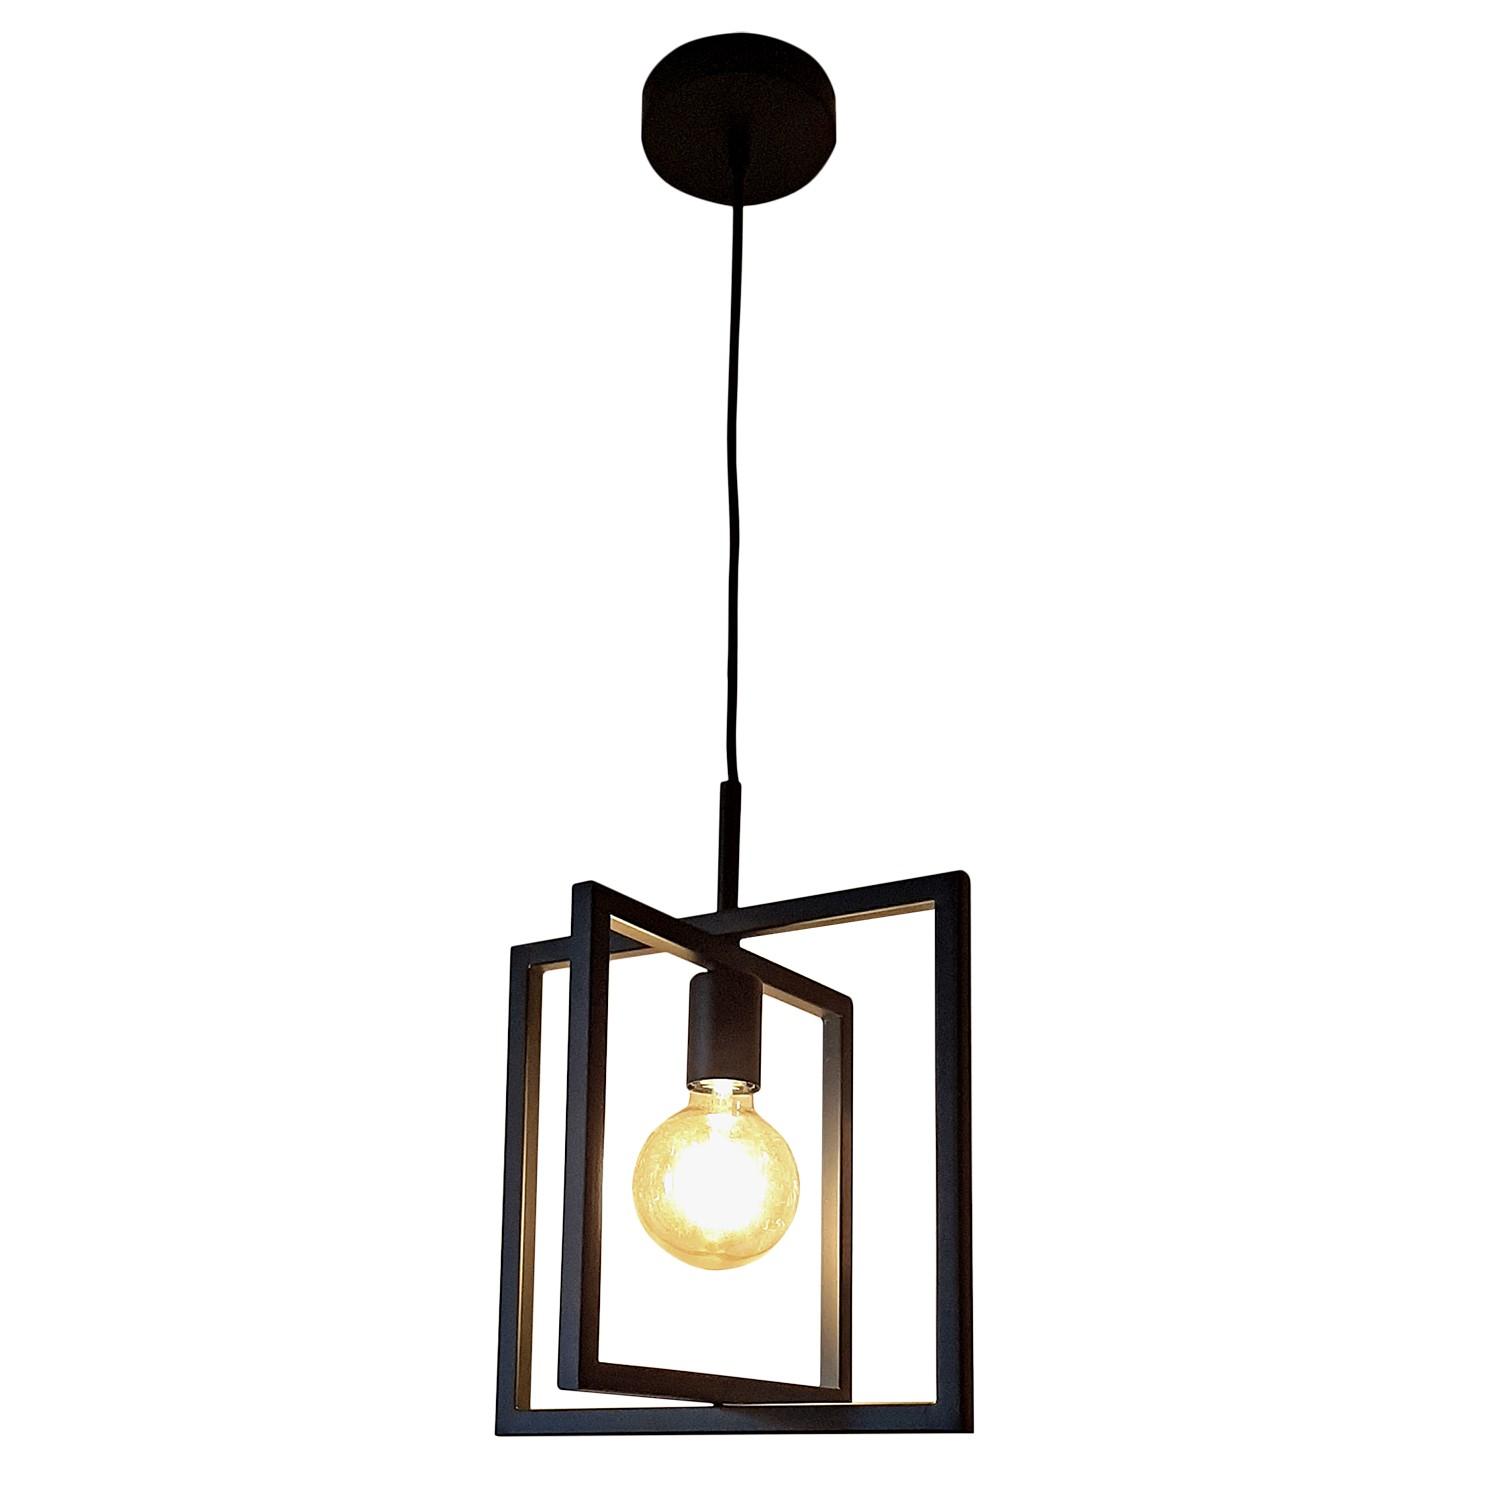 Hanglamp Silhouette Kopen